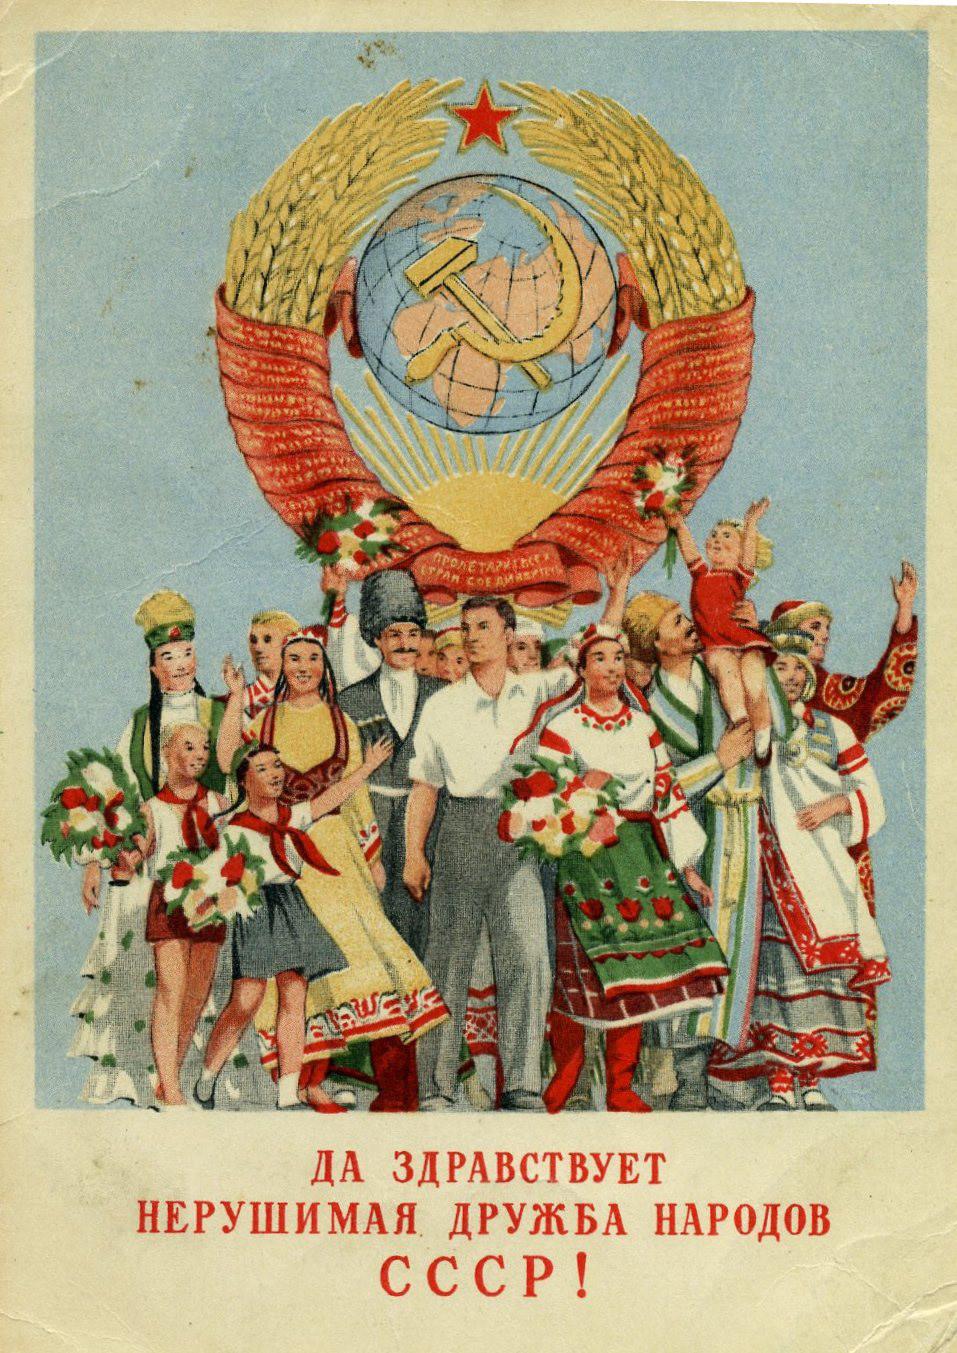 Es grüßt die unerschütterlische Freundschaft der Völker der UdSSR!